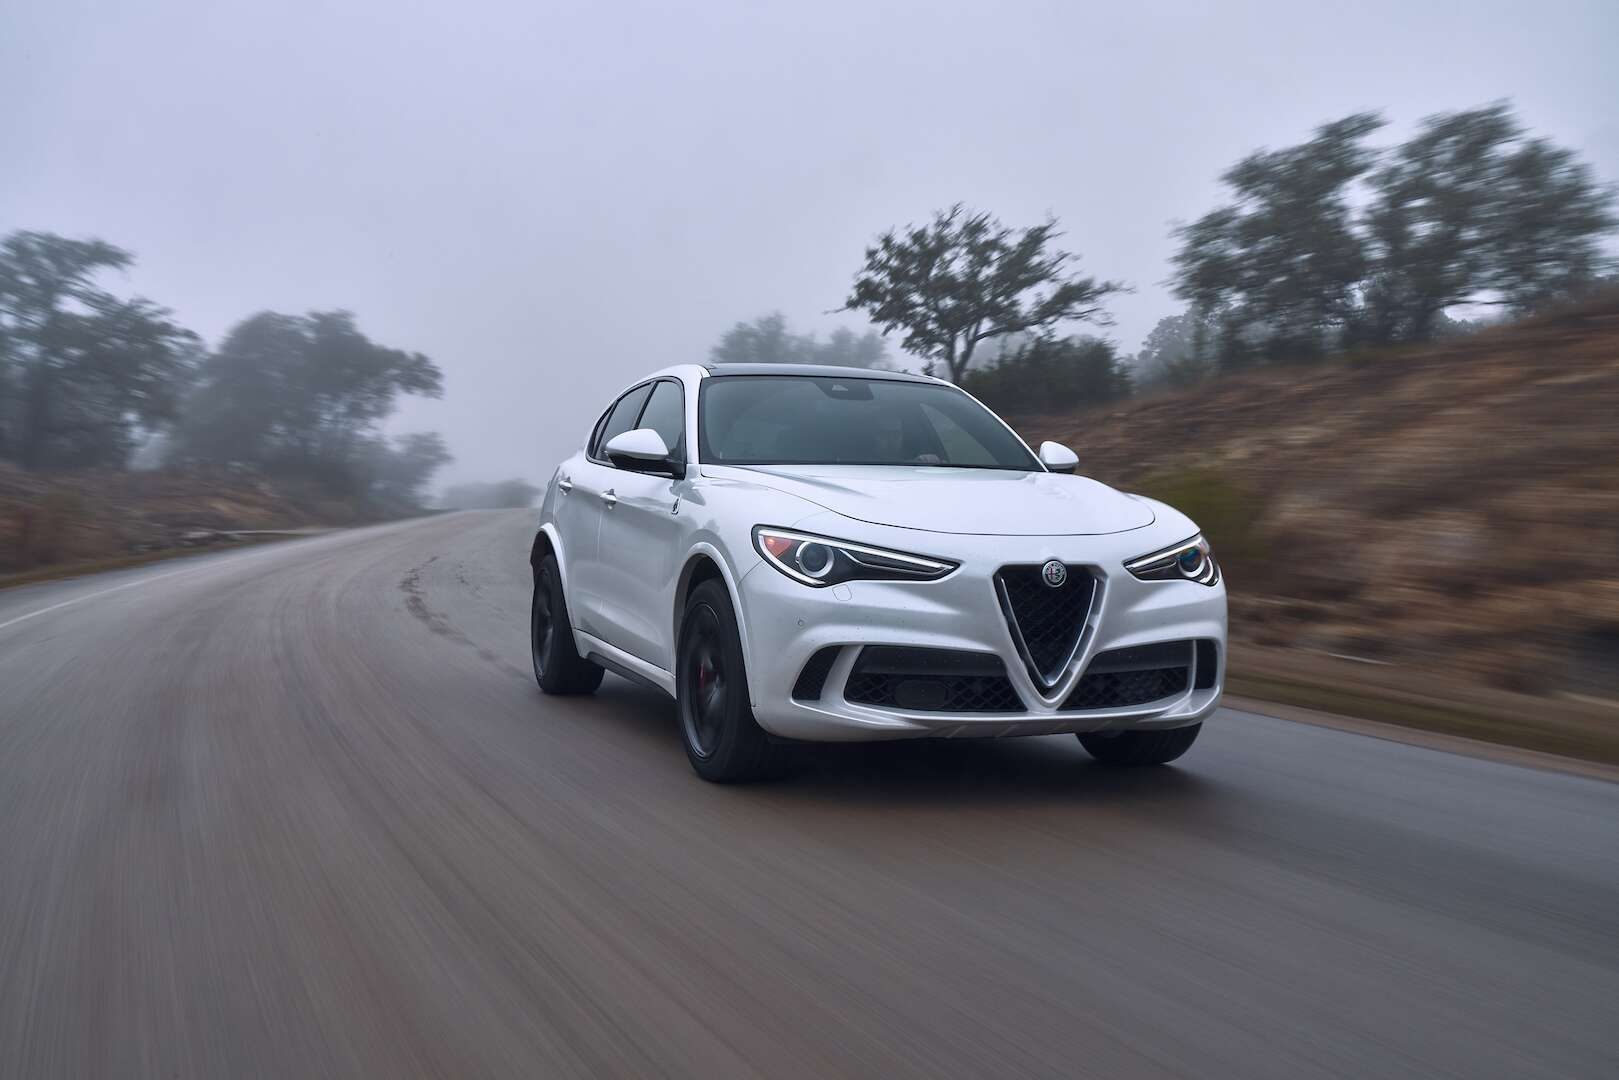 2018 Alfa Romeo Stelvio Quadrifoglio Review Driven Hard A Sport